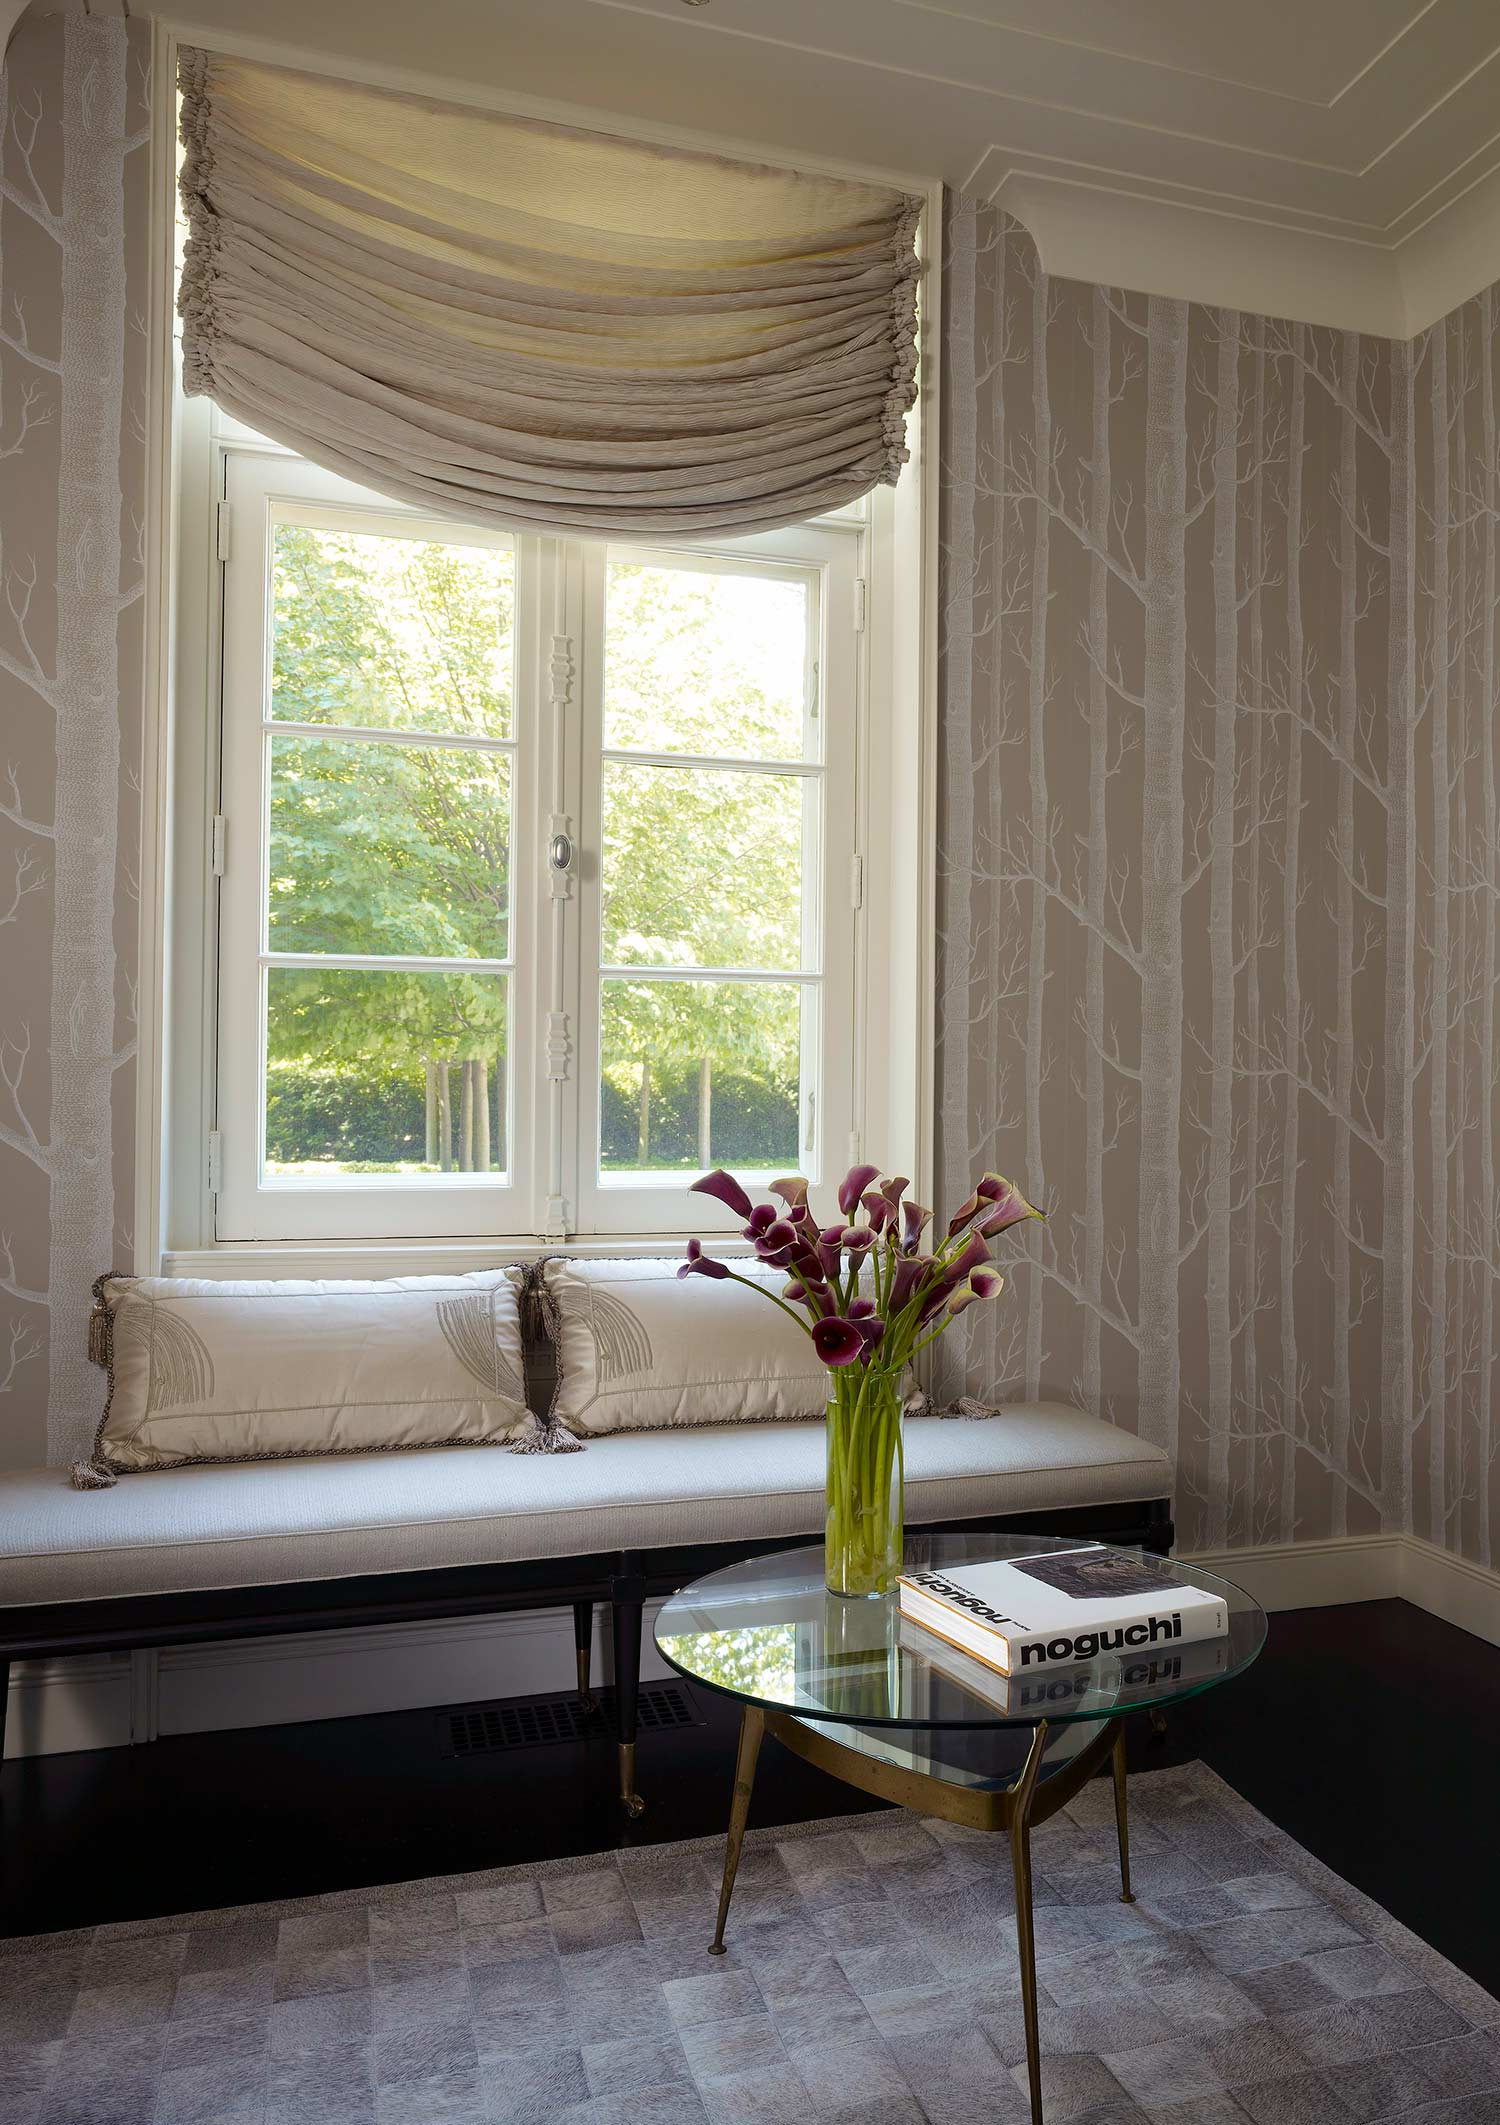 upholstery & window treatments  Interior Design: Leslie Jones & Associates, Inc.